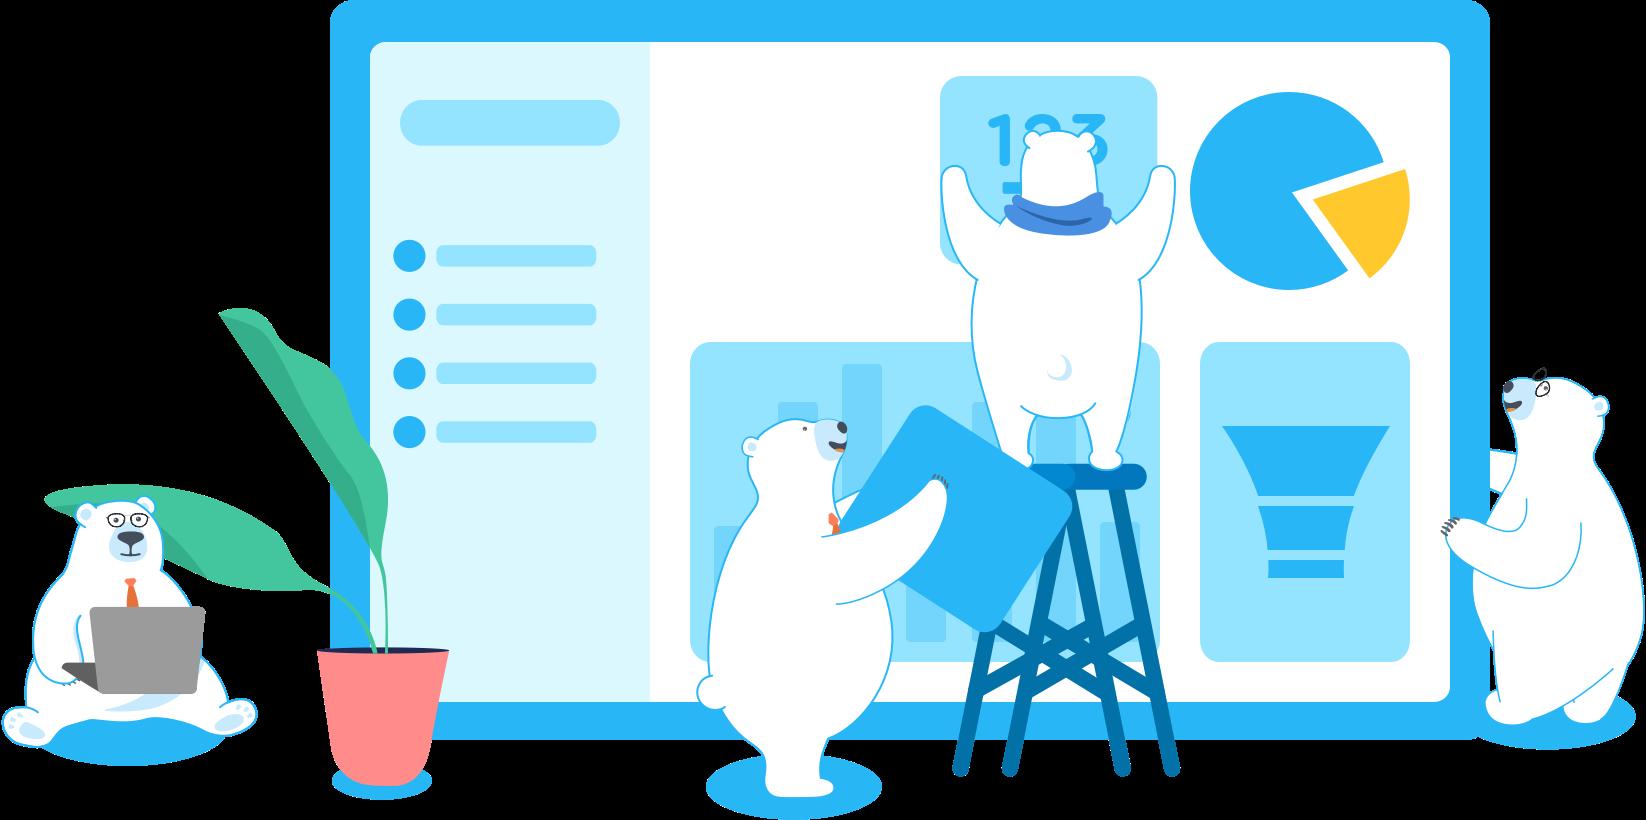 DataDeck Teamwork Ice Bears